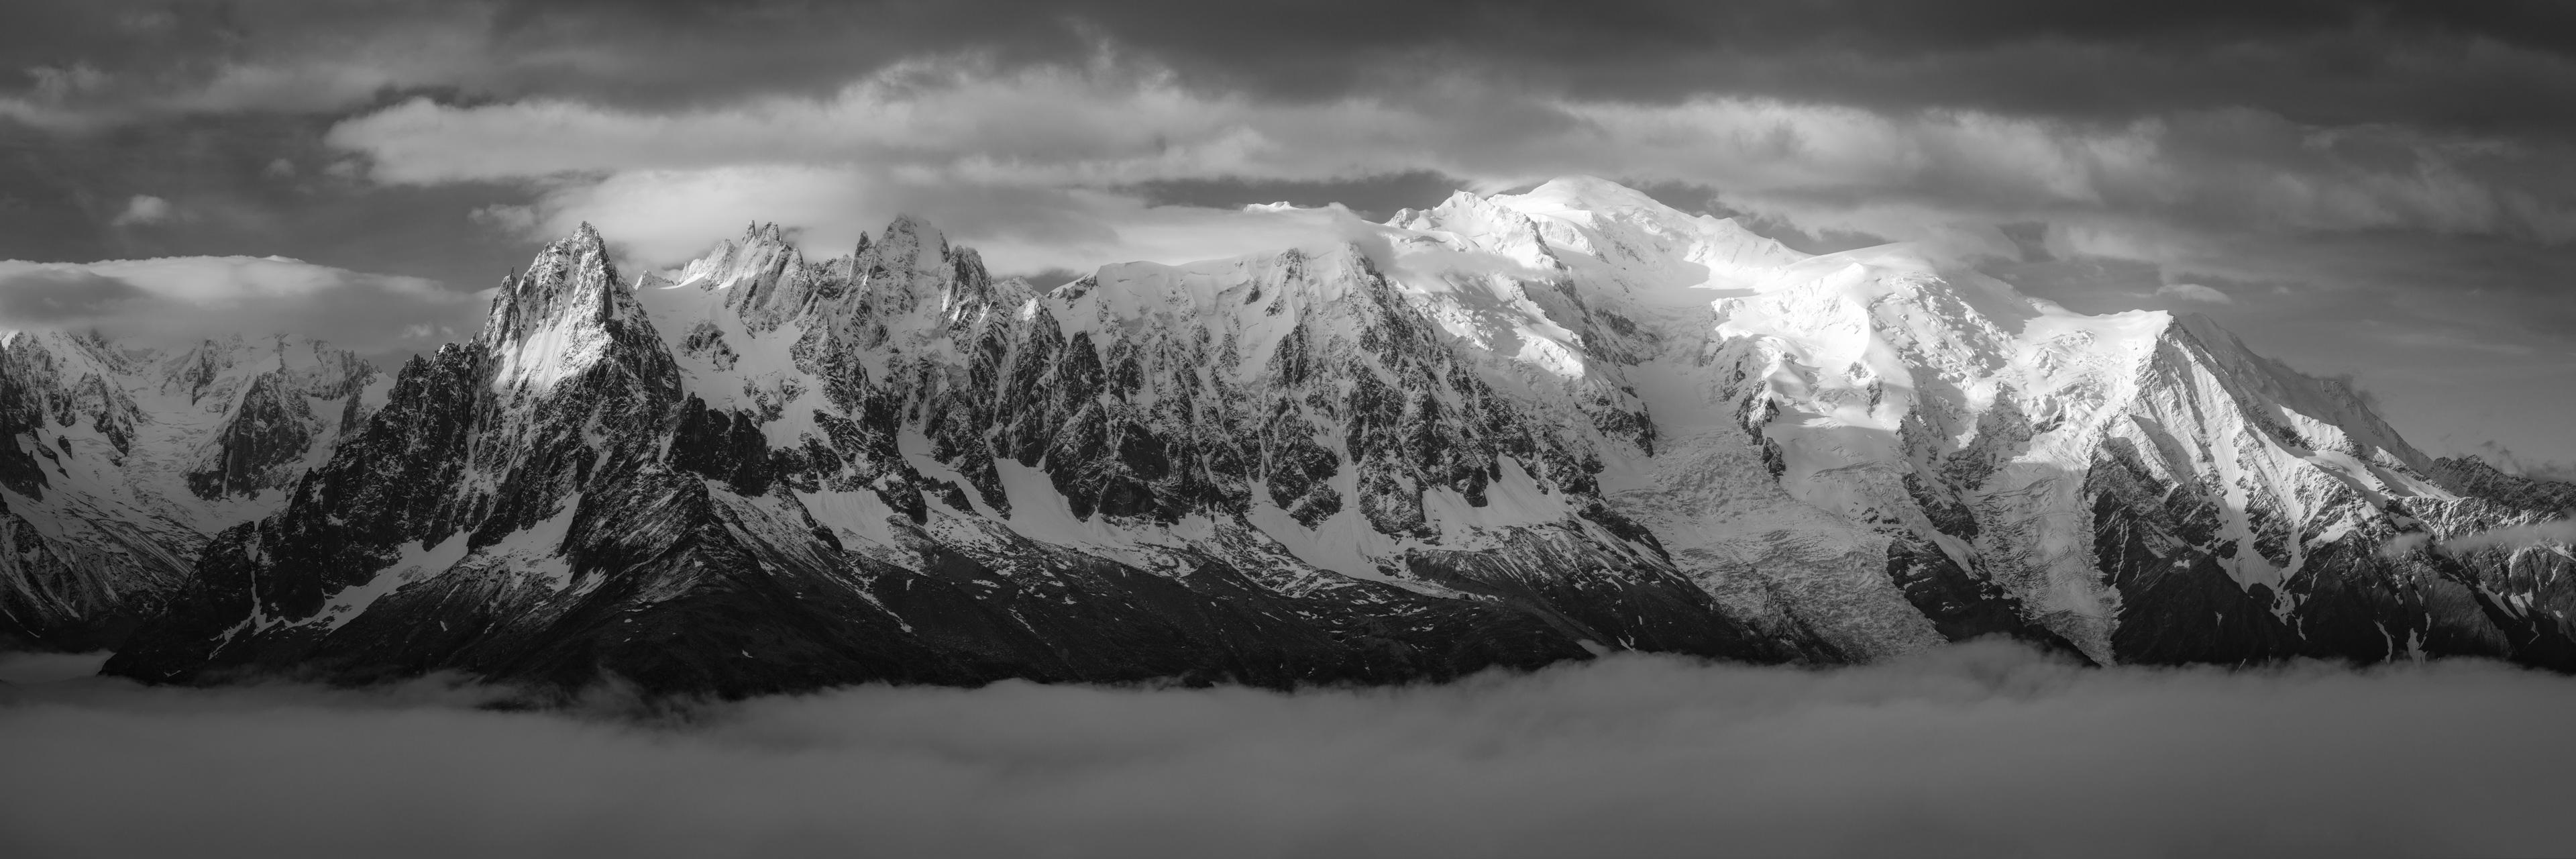 Massif Mont-Blanc-Chamonix - Aiguille de Chamonix